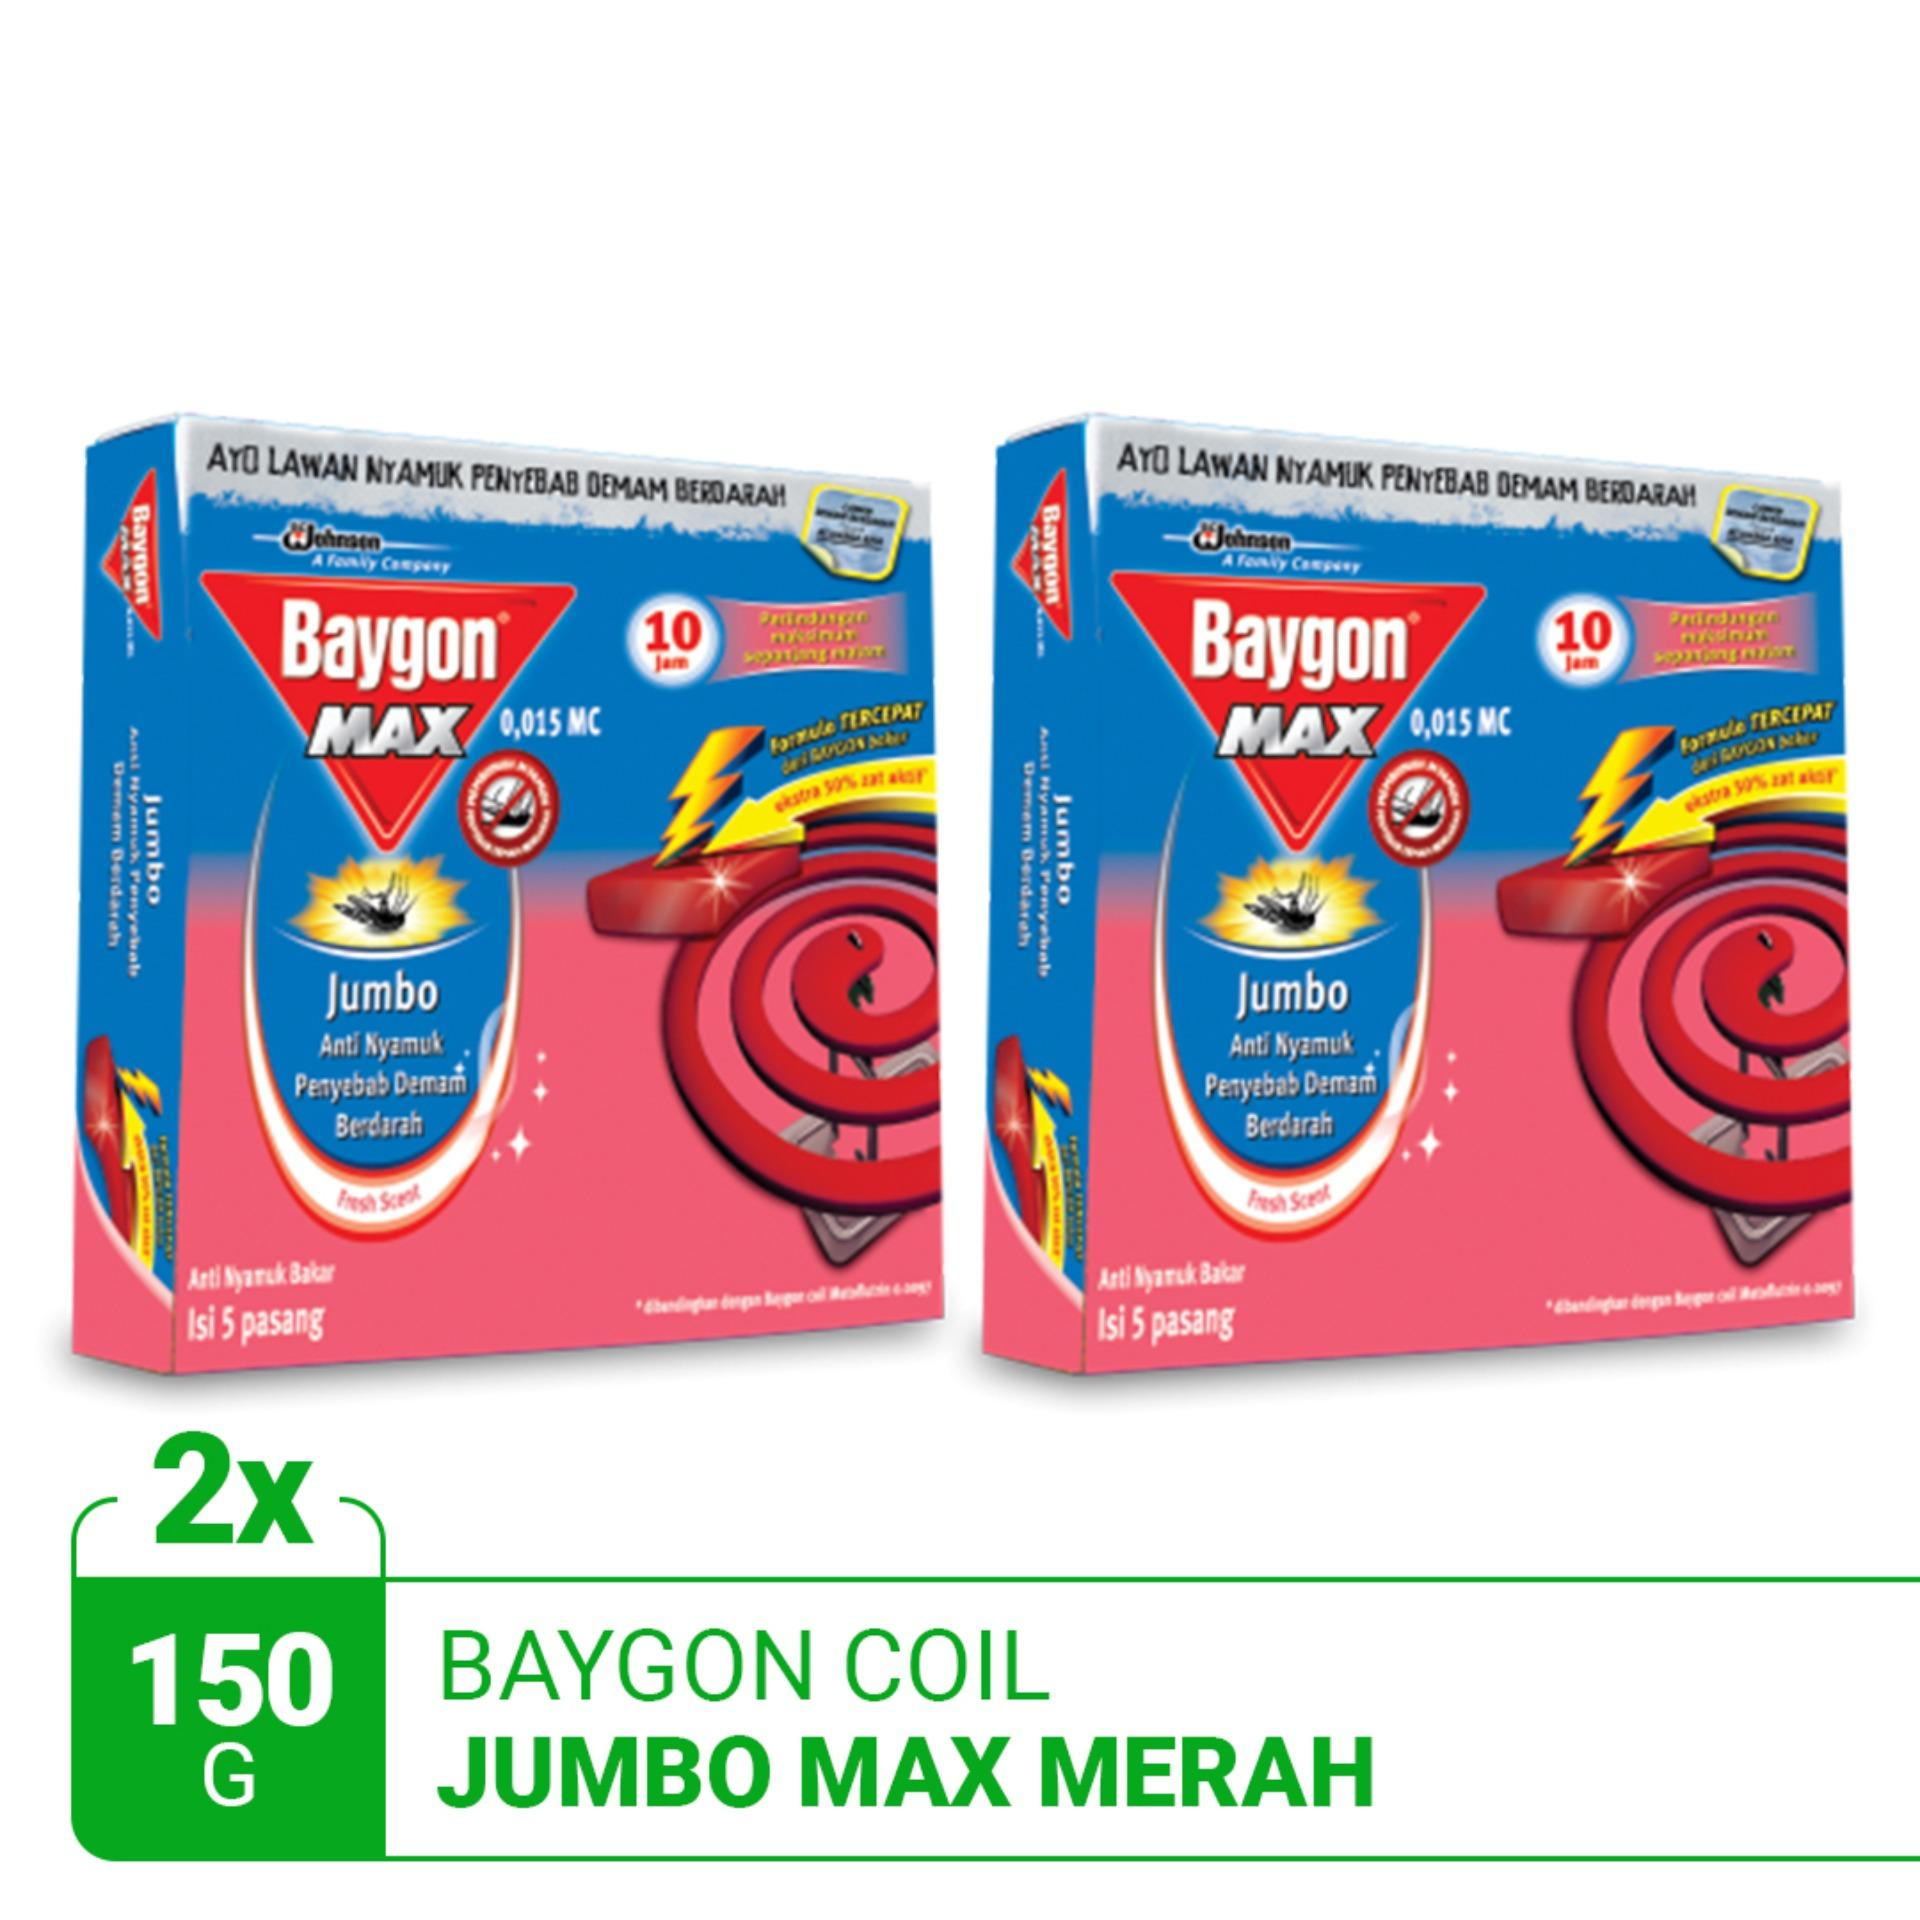 Jual Produk Baygon Terbaru | lazada.co.id